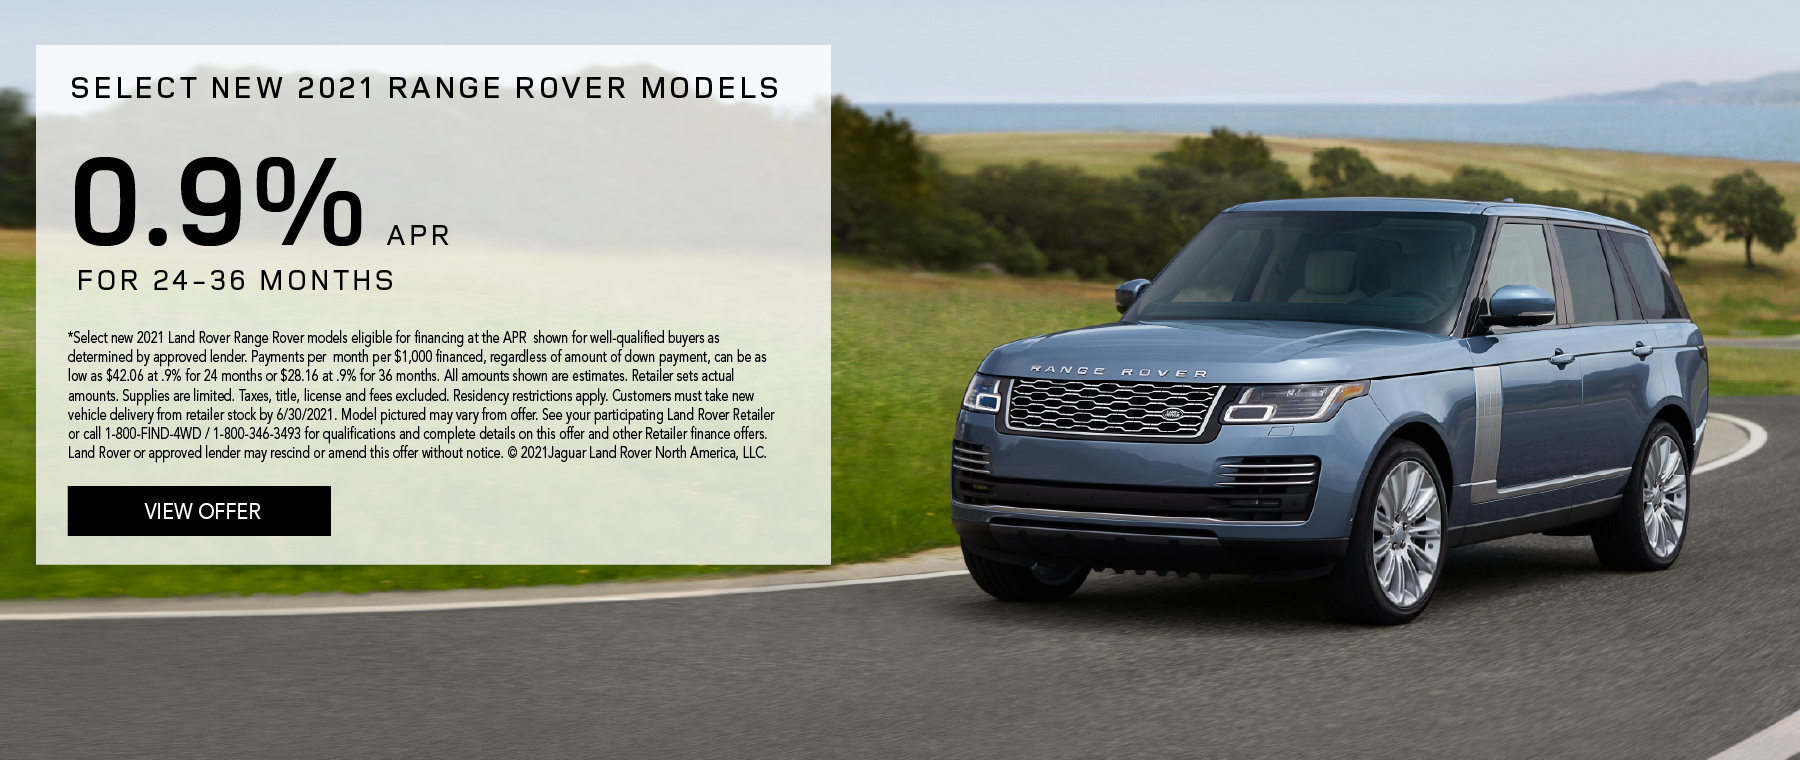 642021 Range Rover – APR